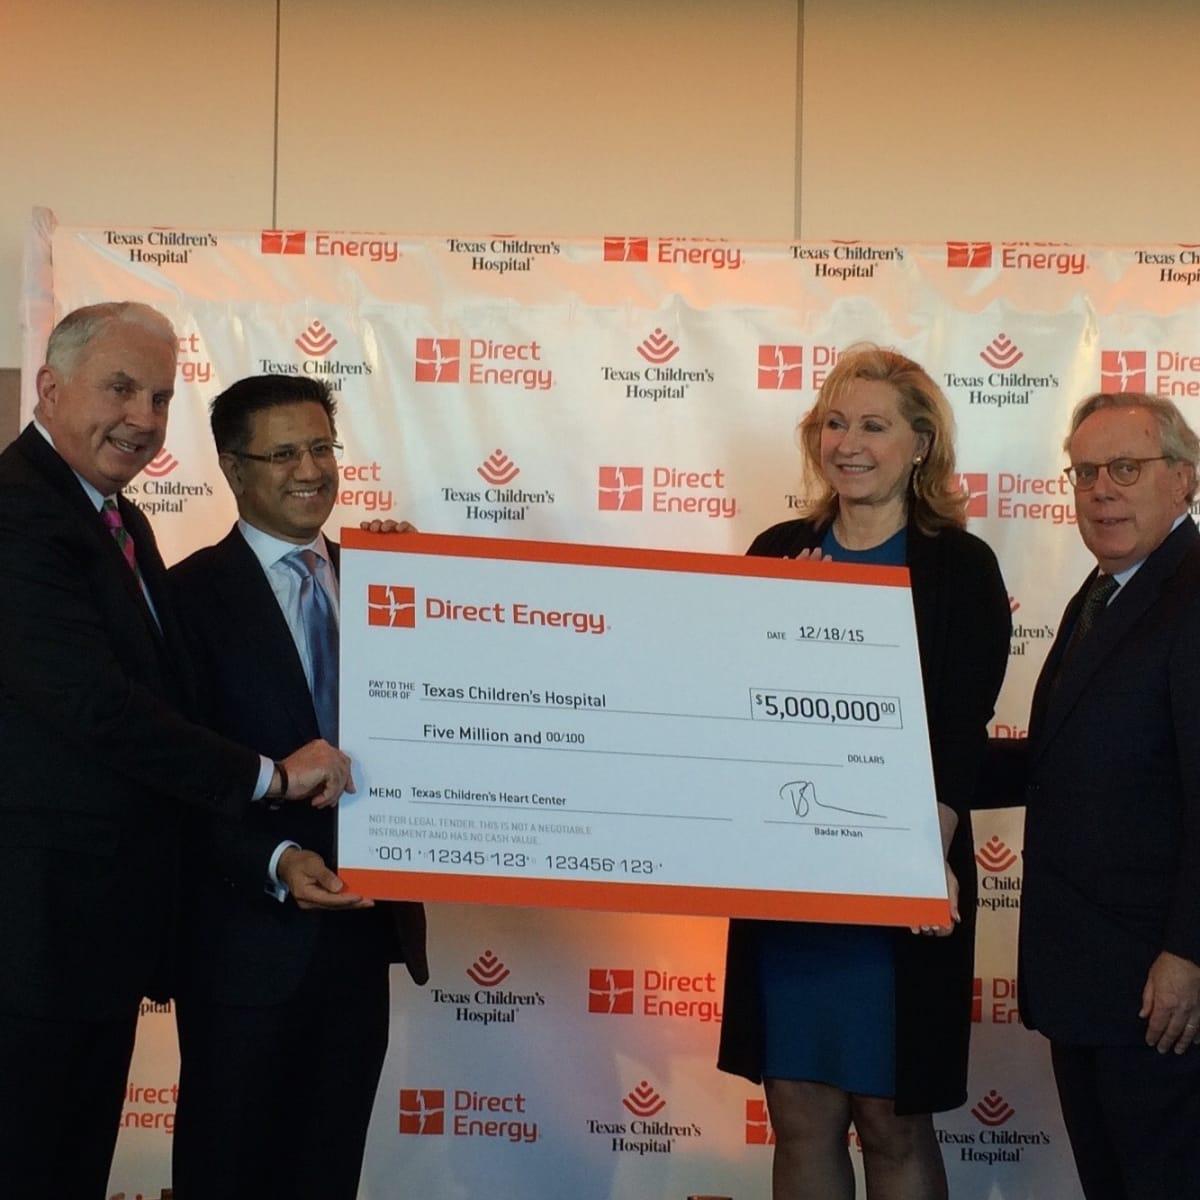 Direct Energy gift to Texas Children's Hospital, Mark Wallace,Badar Khan, Carol Linn, Michael Linn